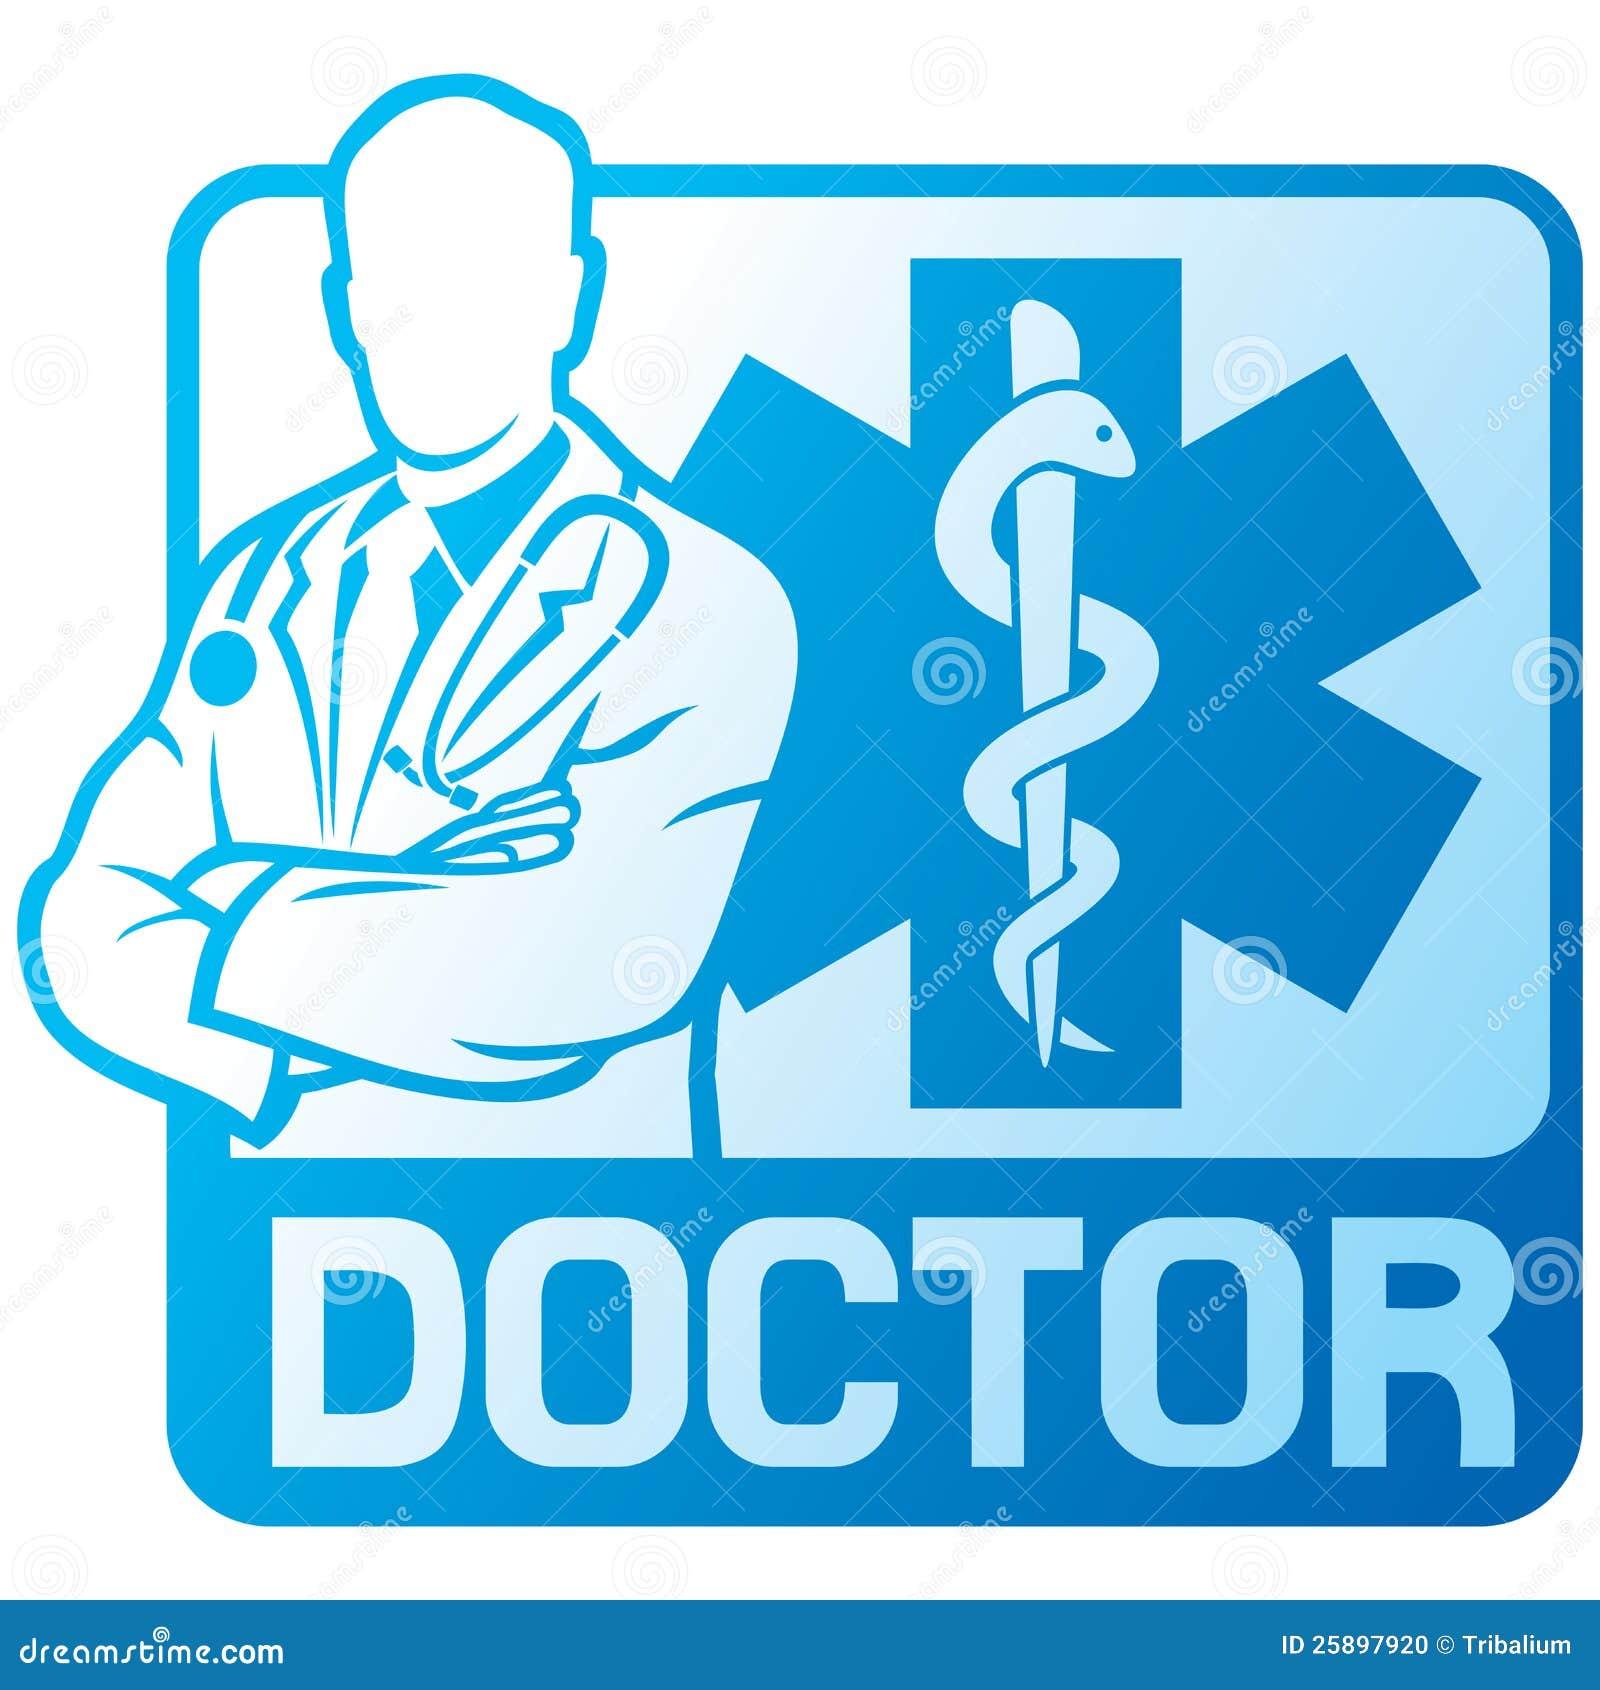 Medical Doctor Symbol Stock Vector Illustration Of Ambulance 25897920